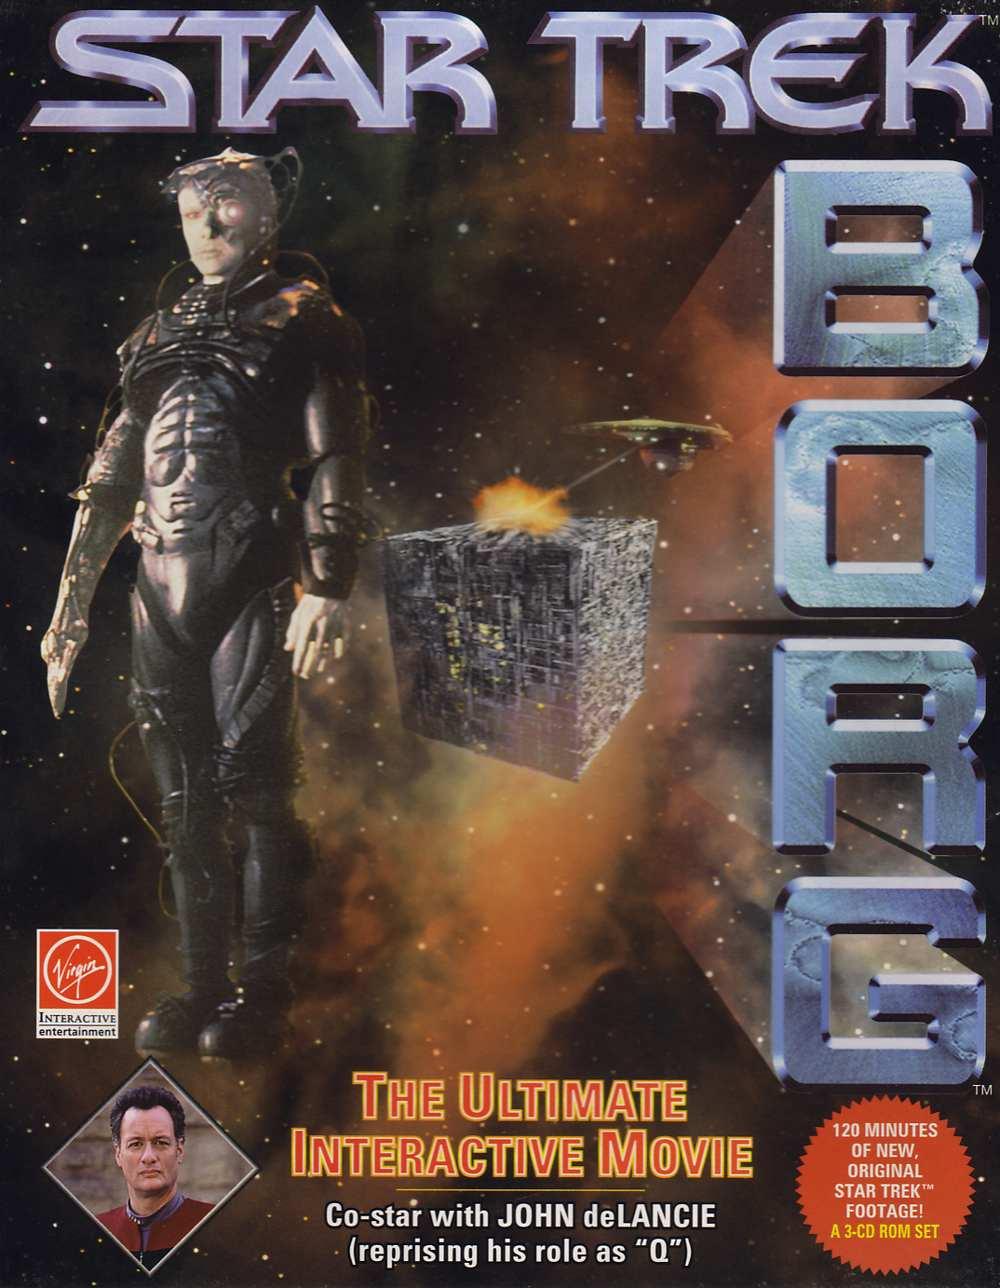 star trek borg video game 1996 imdb